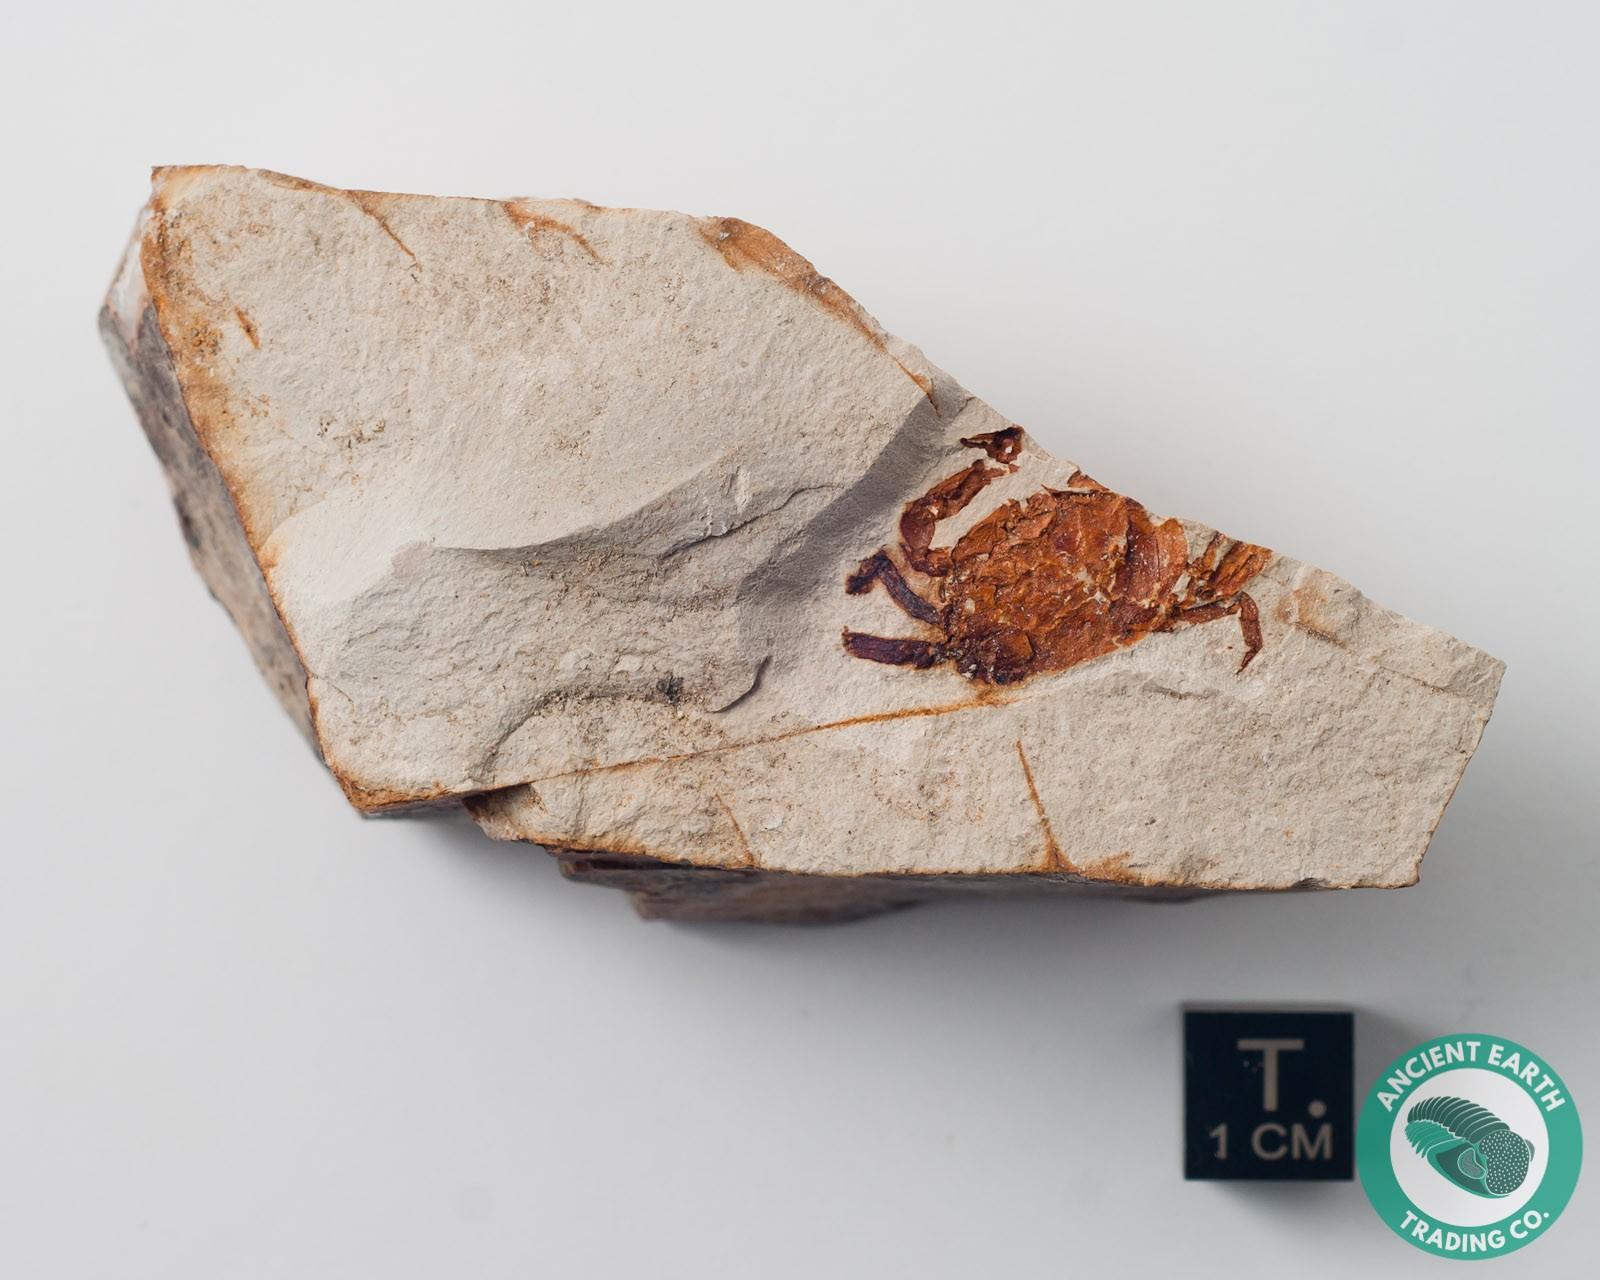 Bright Red Pea Crab Fossil Pinnixa - California